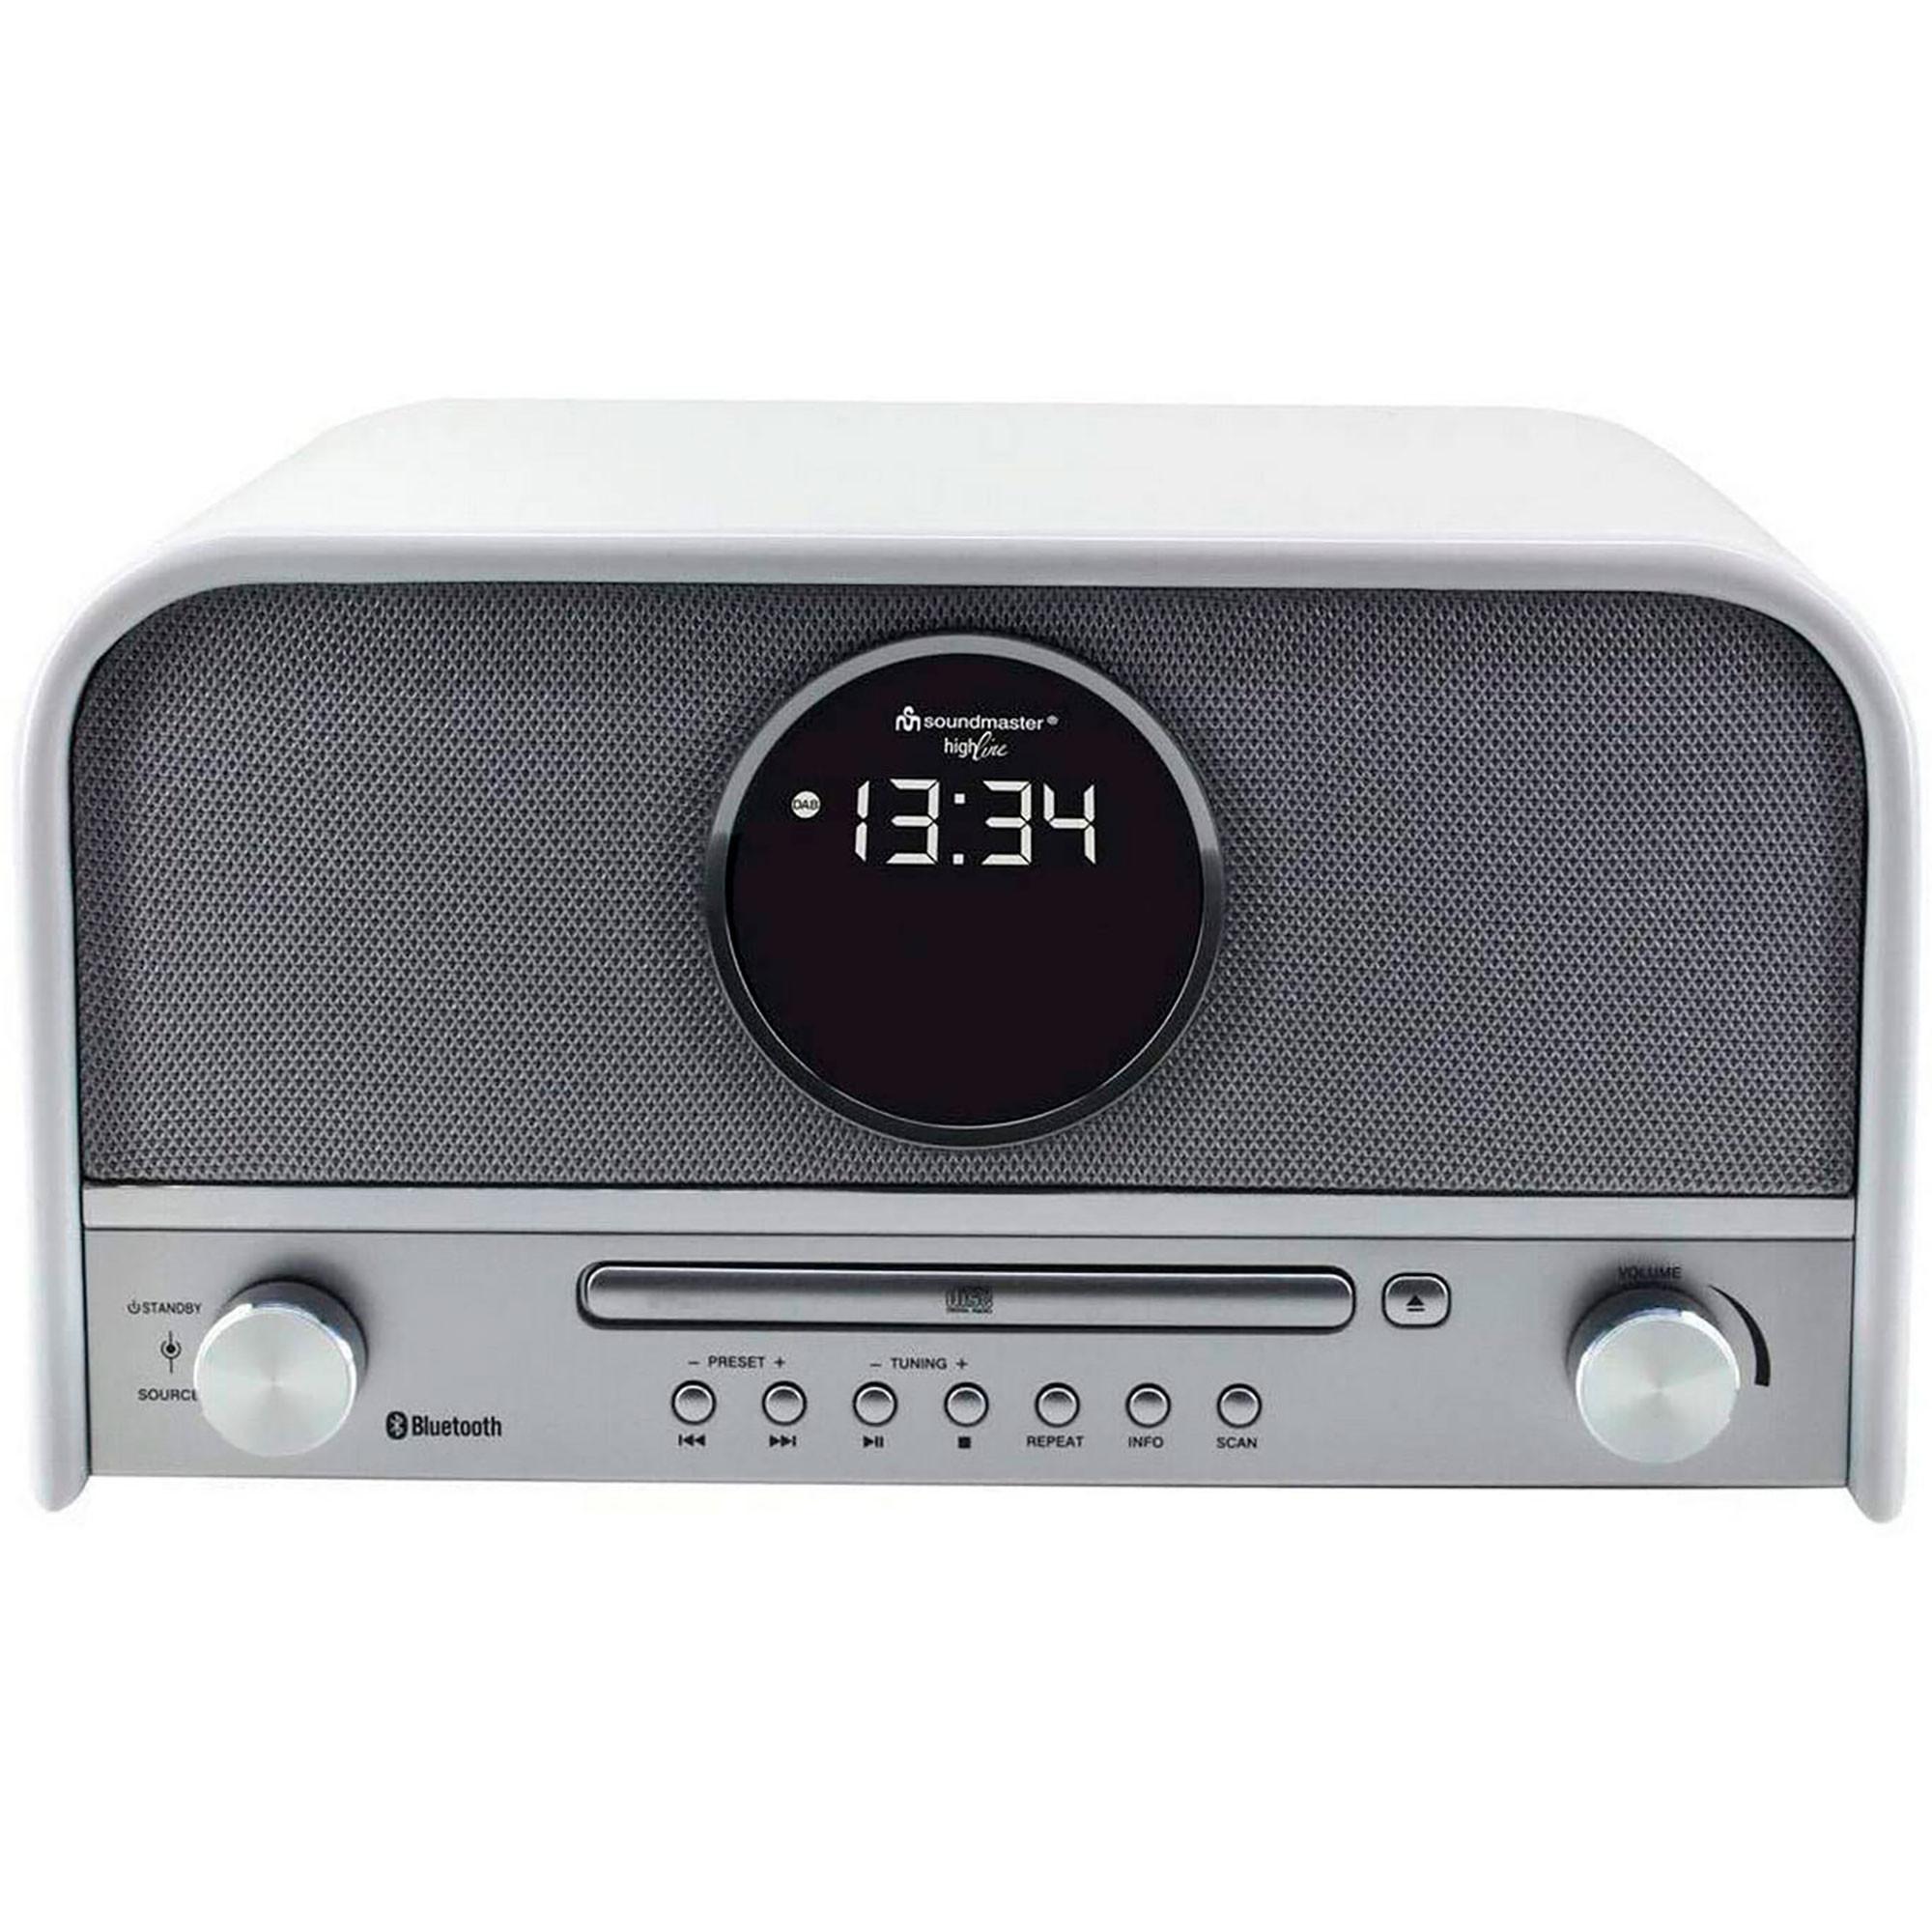 Soundmaster NR850WE Radio DAB+/FM, Reproductor CD/MP3, Bluetooth, Mando a Distancia, Estilo Retro, Blanco